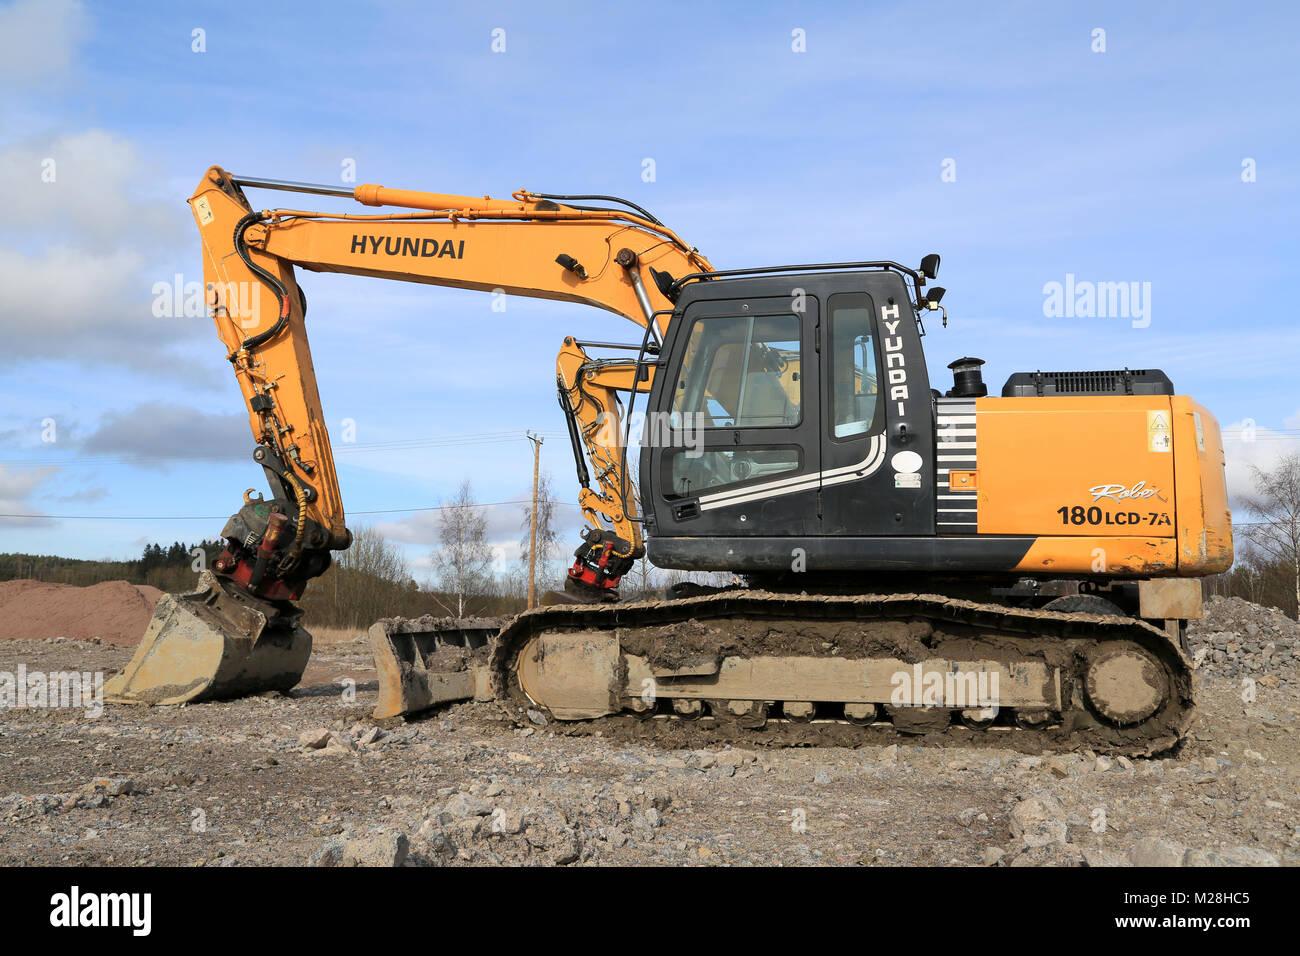 TURKU, FINLAND - APRIL 12, 2014: Hyundai Robex crawler excavator at  construction site